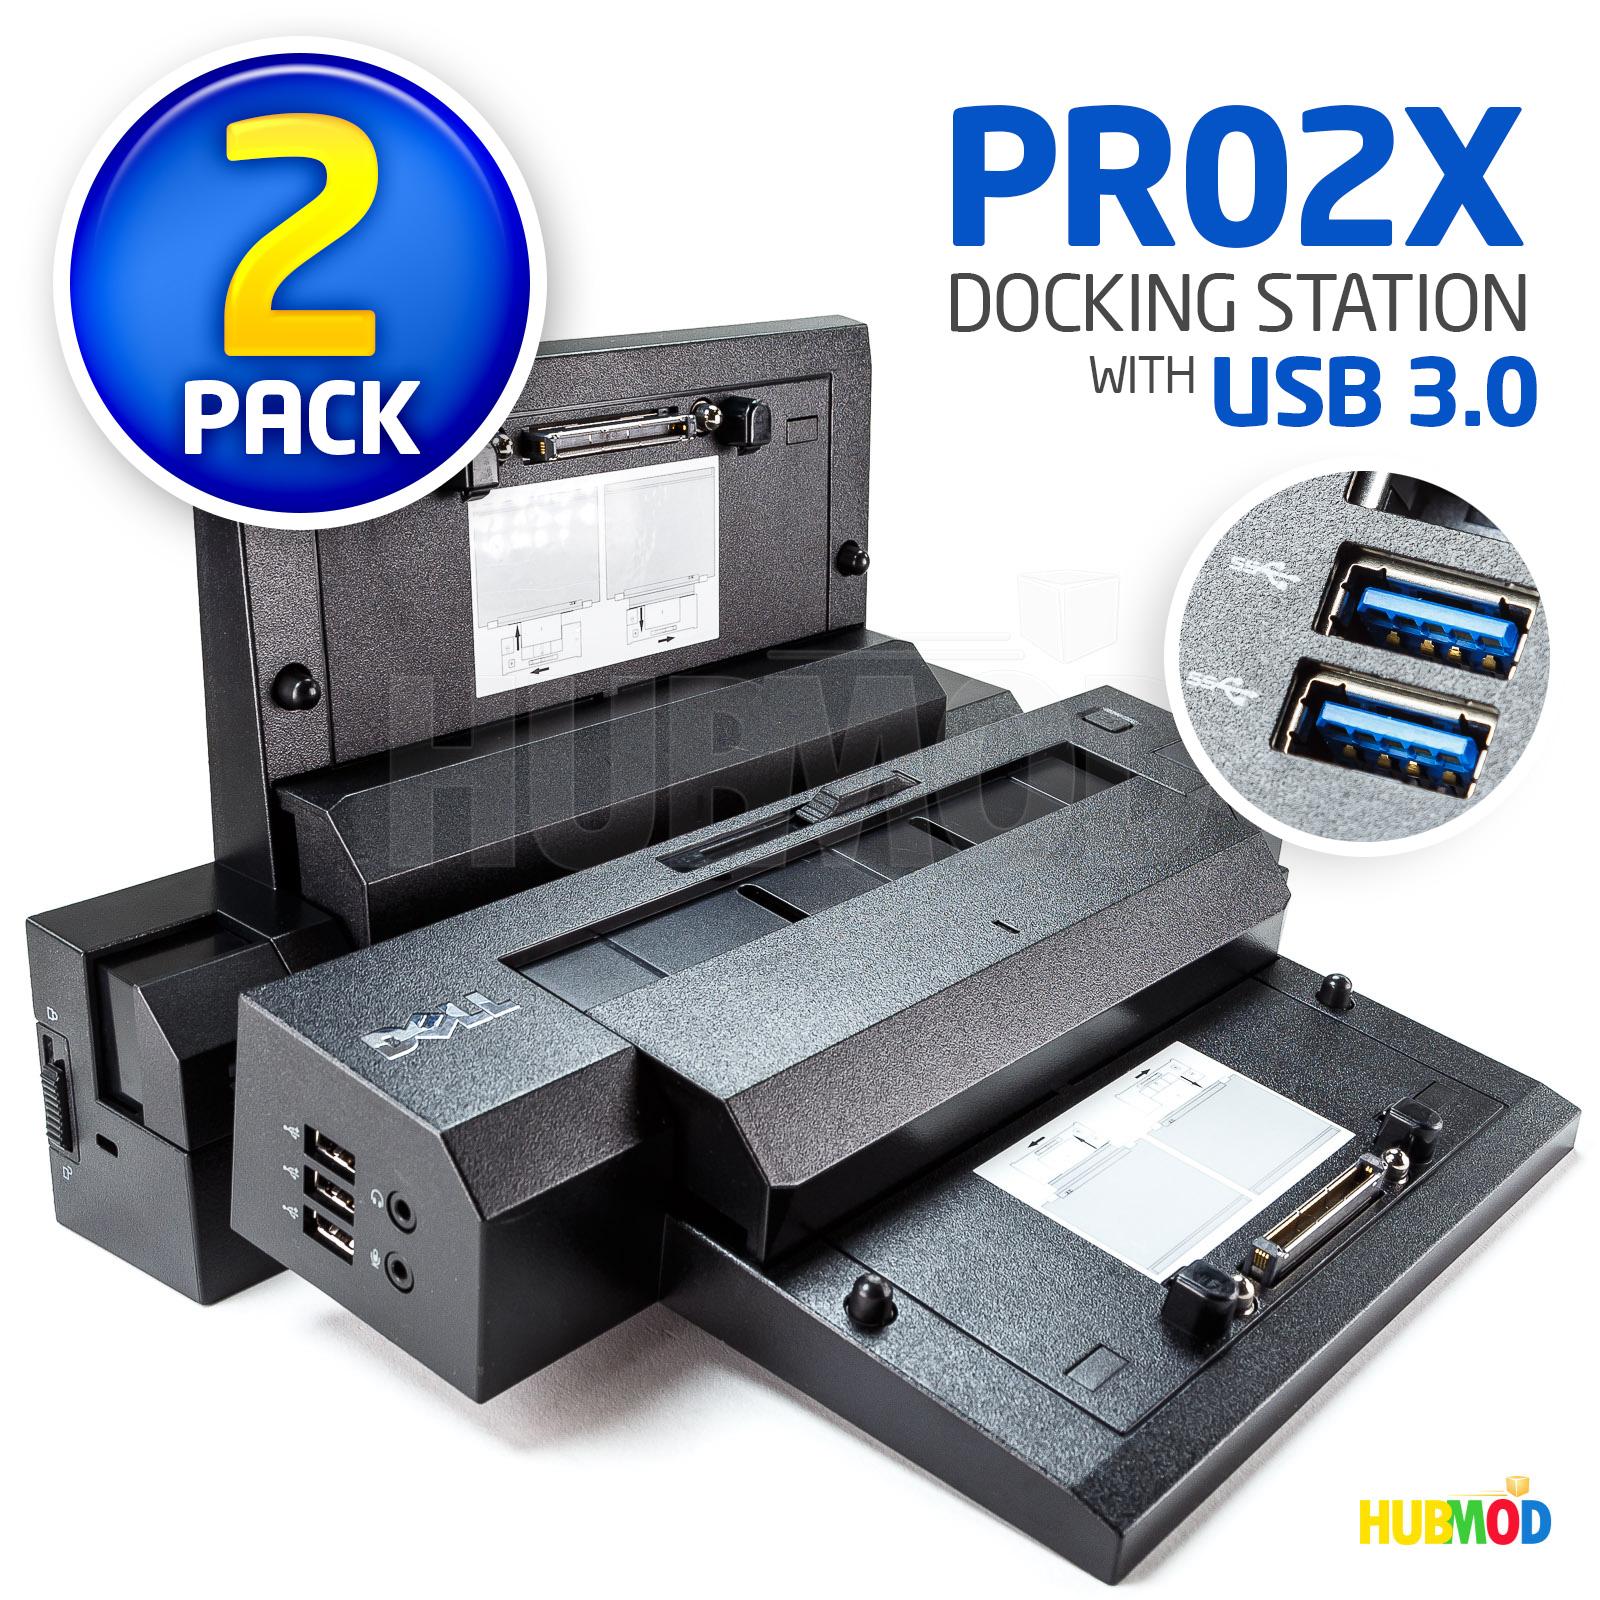 Dell PR02X Advanced E-Port Plus II Port Replicator USB 3.0 Docking Station ONLY